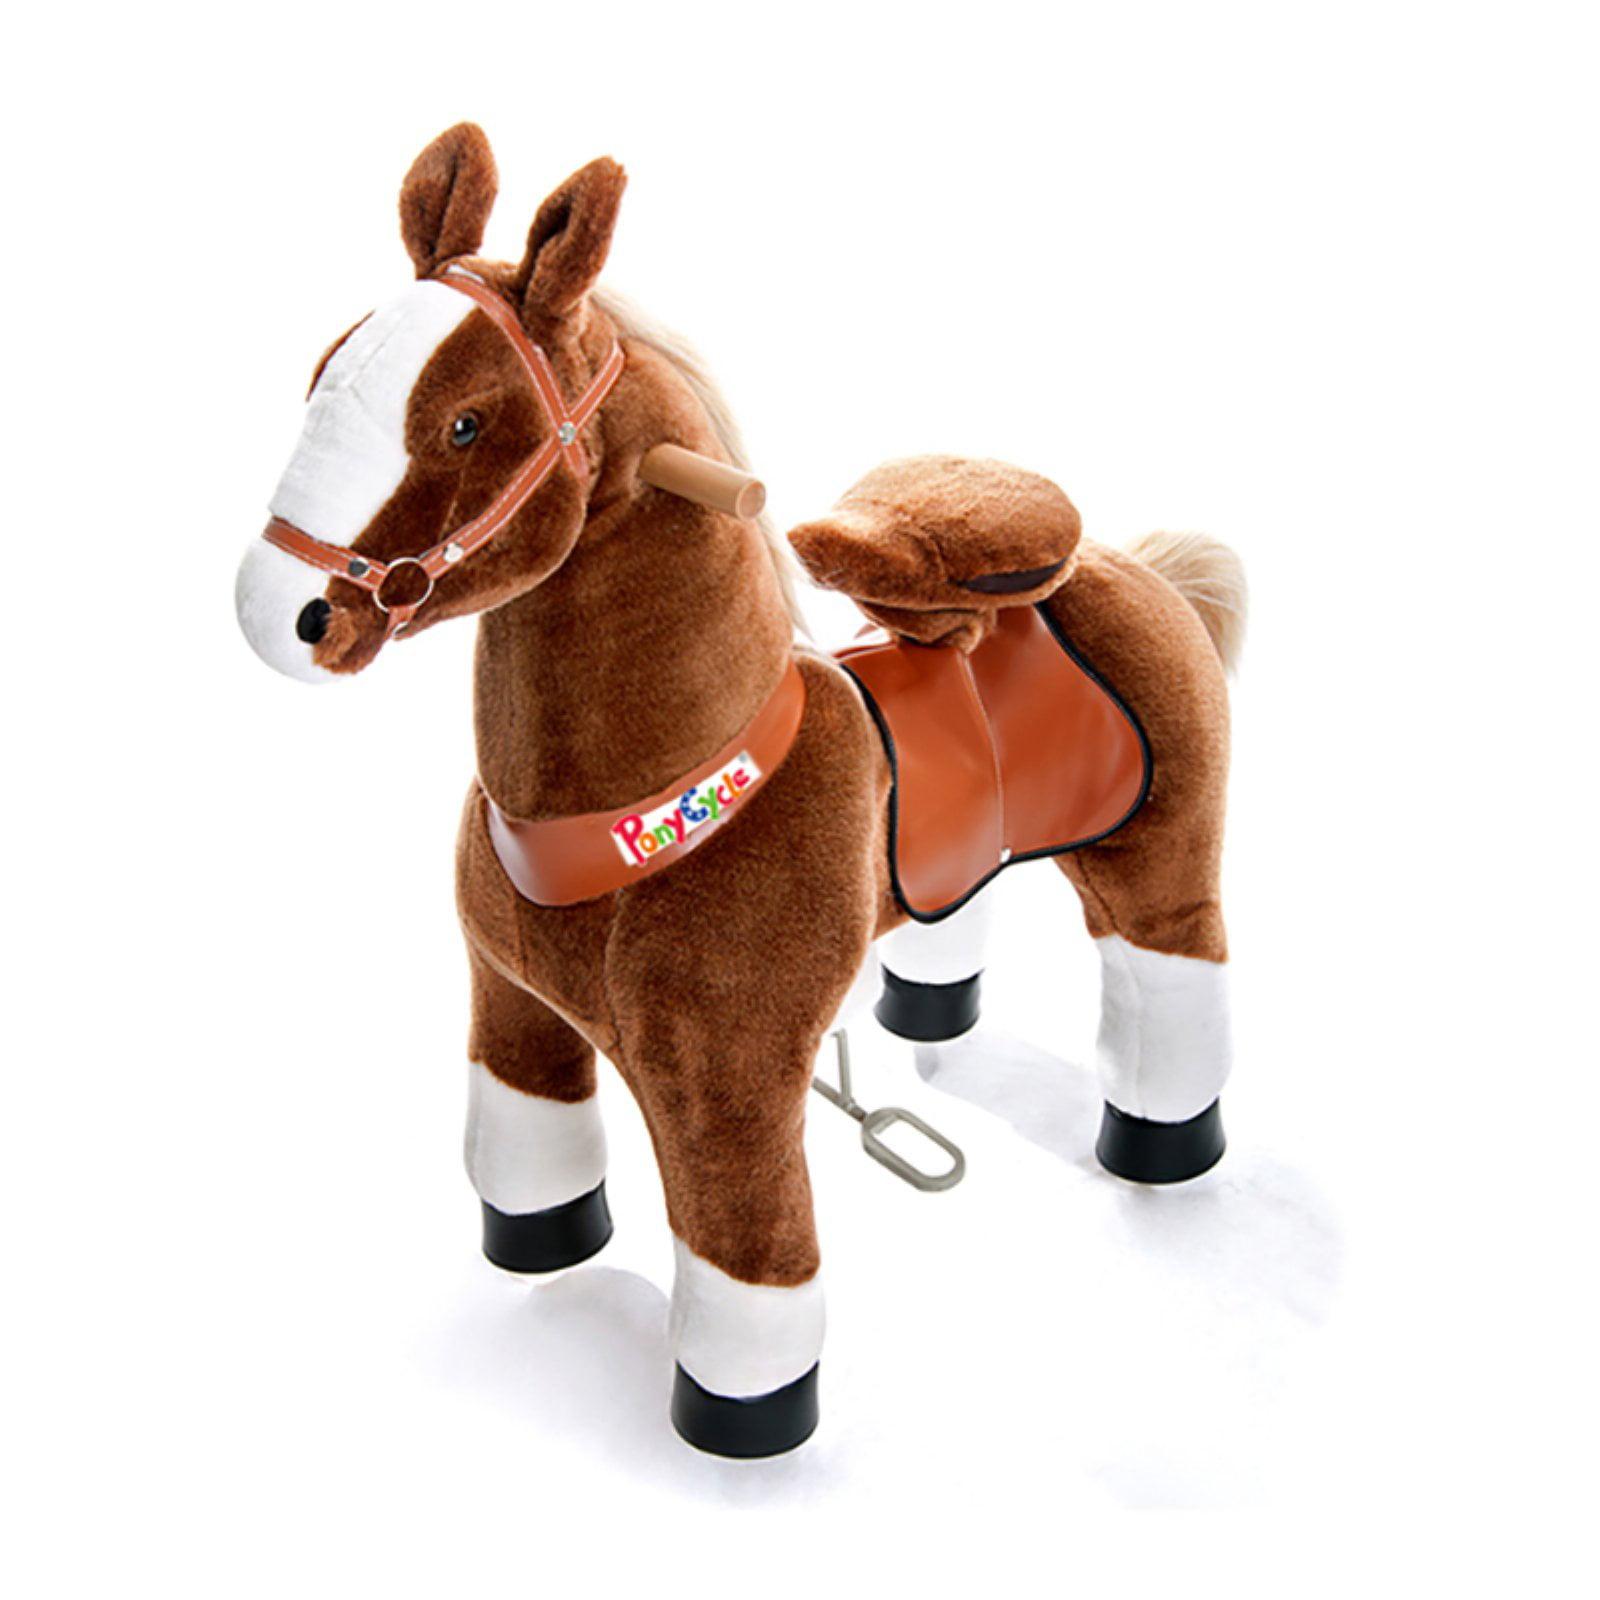 Vroom Rider x PonyCycle Ride-On Horse - Medium